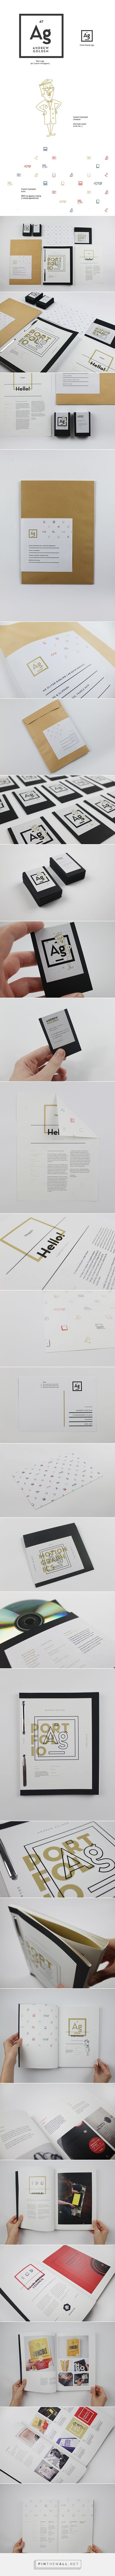 Brand &Id / Andrew Golden - Personal Branding / Portfolio, Stationery and Resume